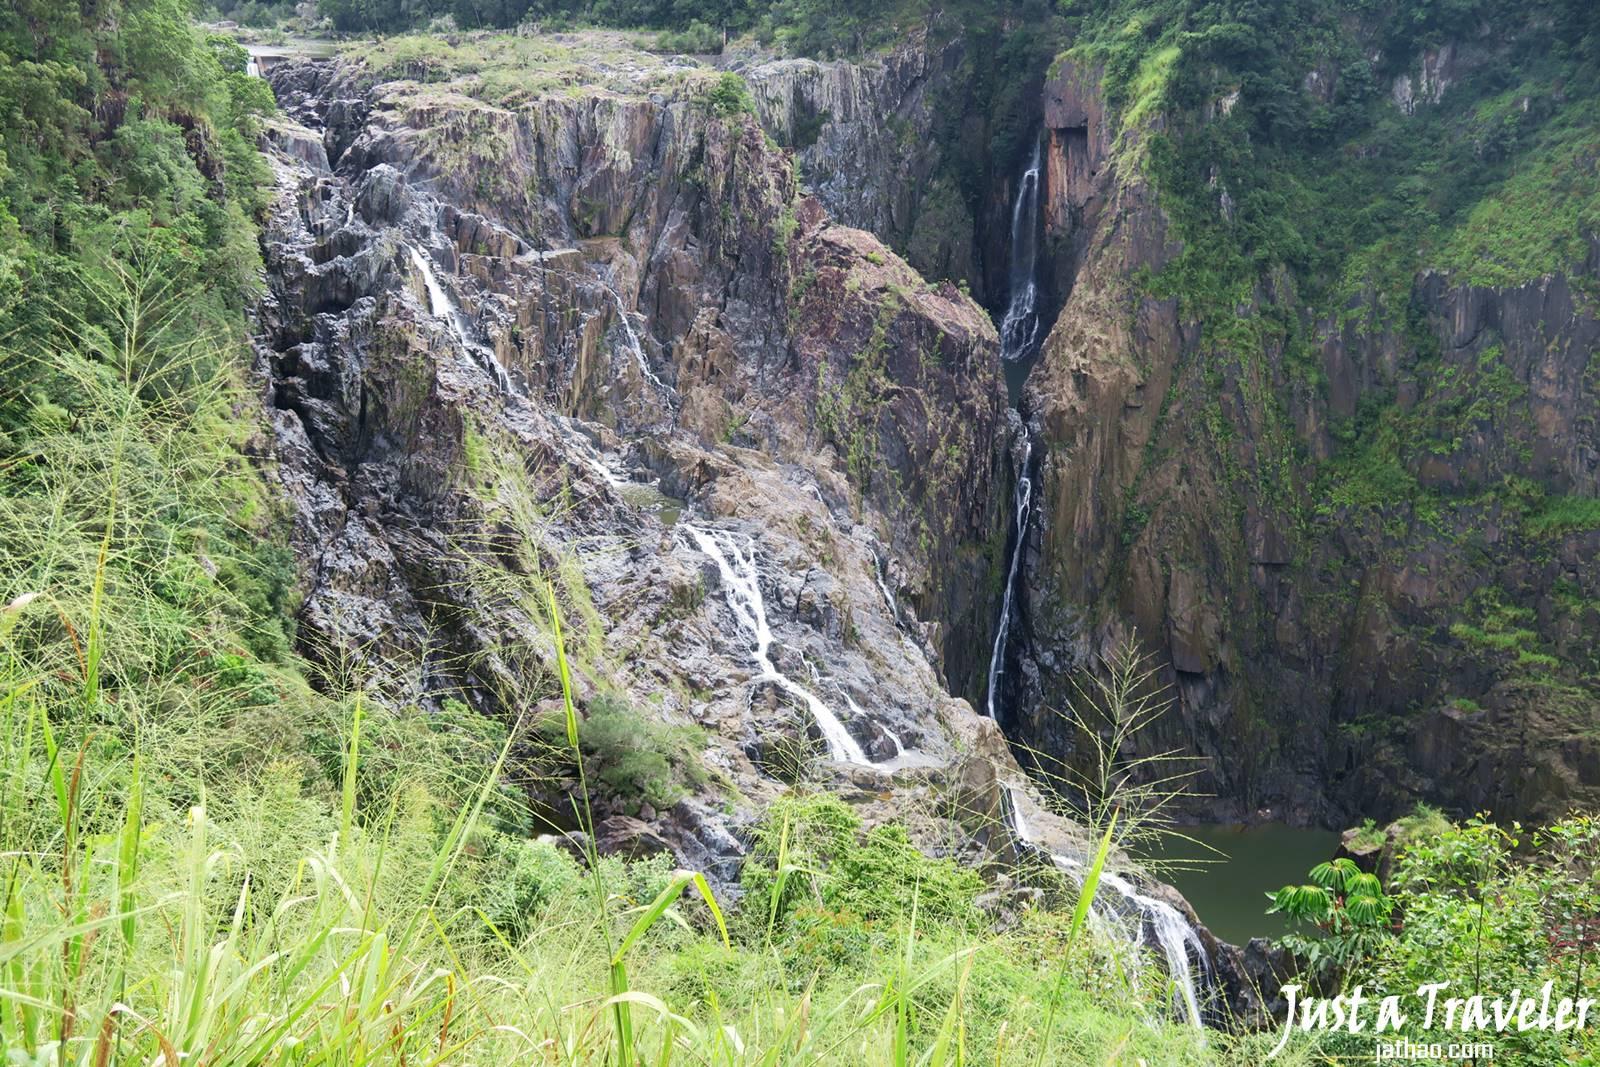 凱恩斯-庫蘭達-交通-觀光火車-景點-巴倫瀑布-自由行-旅遊-澳洲-Cairns-Kuranda-Scenic-Railway-Barron-Falls-Travel-Tourist-Attraction-Australia